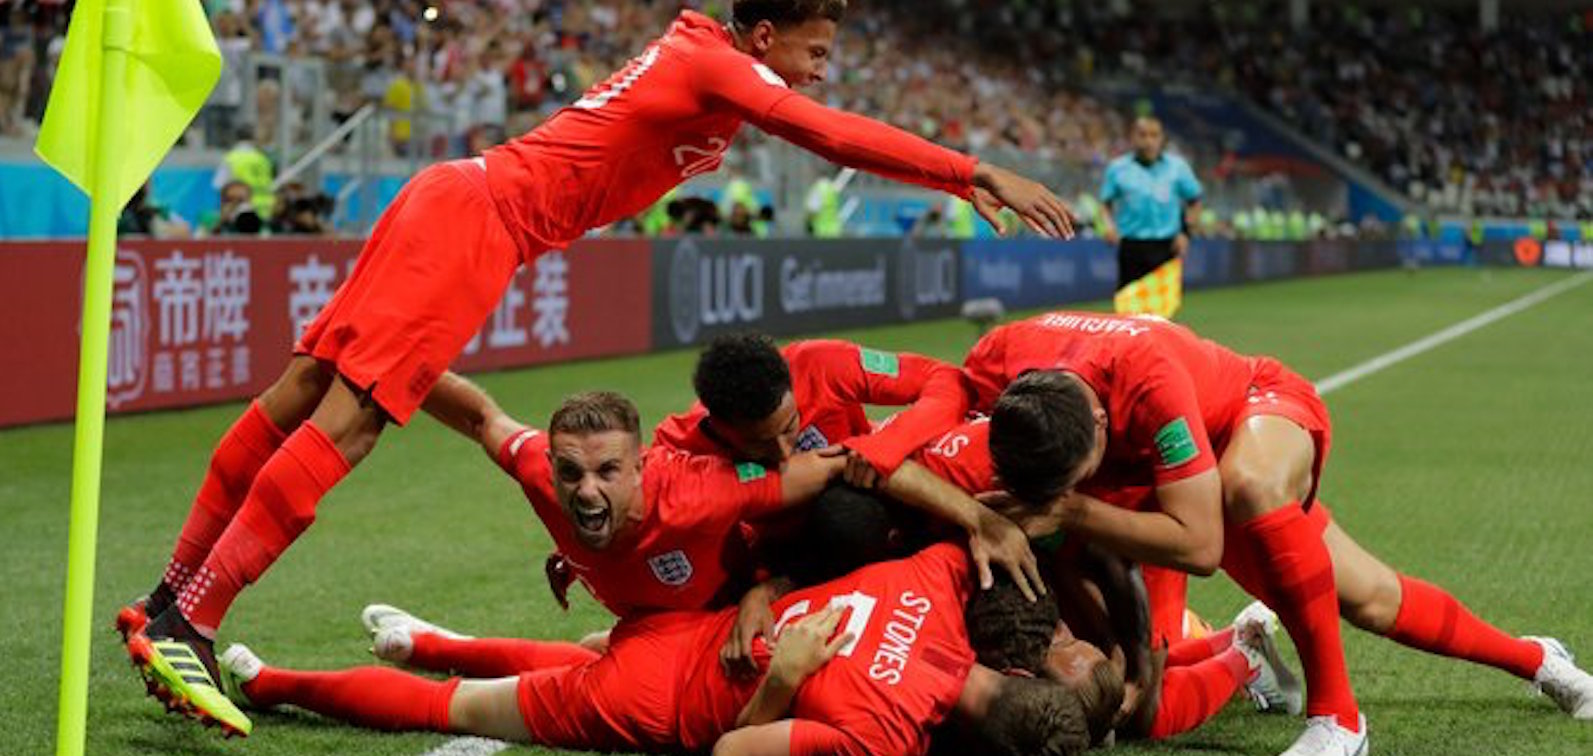 Photo gallery: Marcus Rashford, Jesse Lingard and Luke Shaw training with England